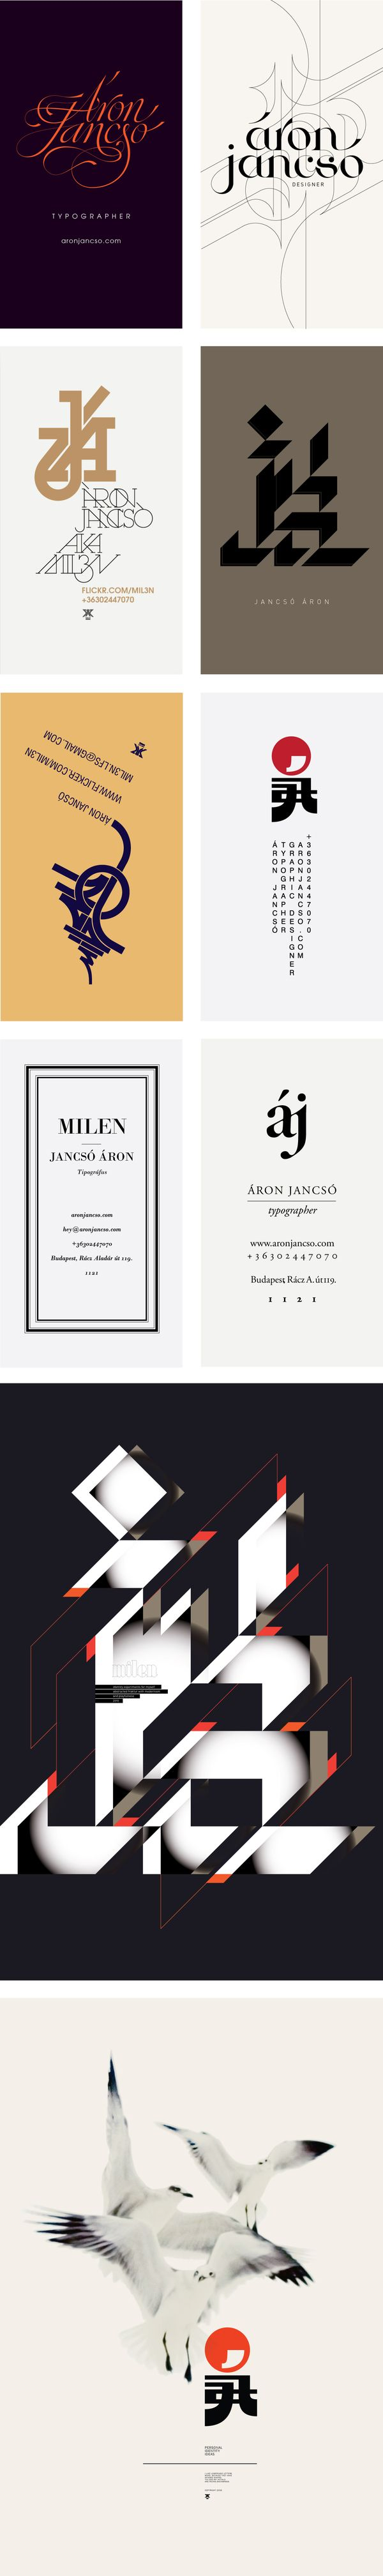 Áron JancsóDesign Inspiration,  Internet Site, Aron Jancso,  Website, Brand Identity, Web Site, Graphics Design, Brand Concept, Áron Jancsó